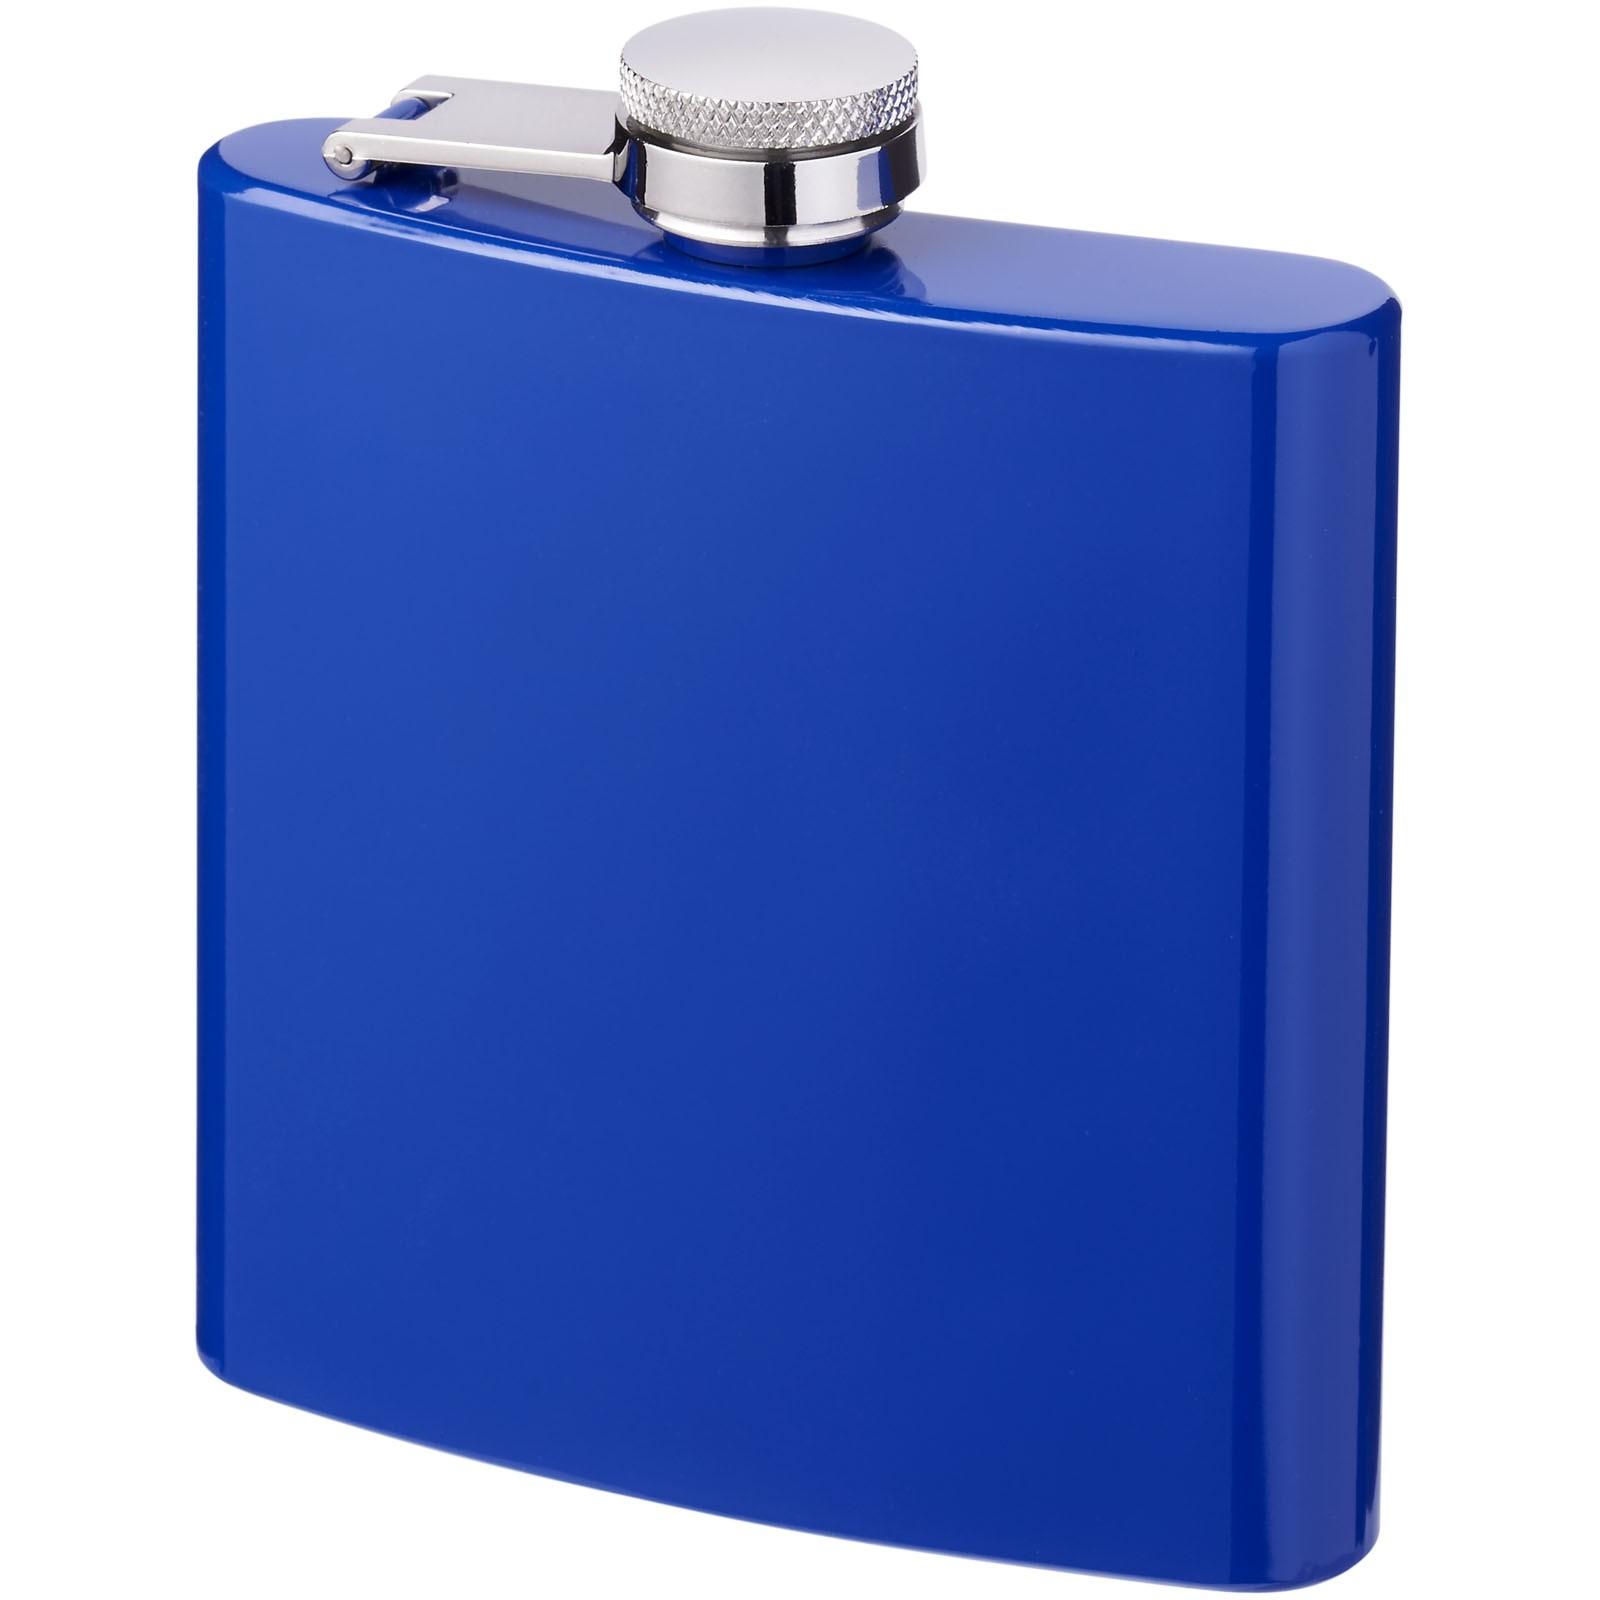 Elixer 175 ml hip flask - Blue